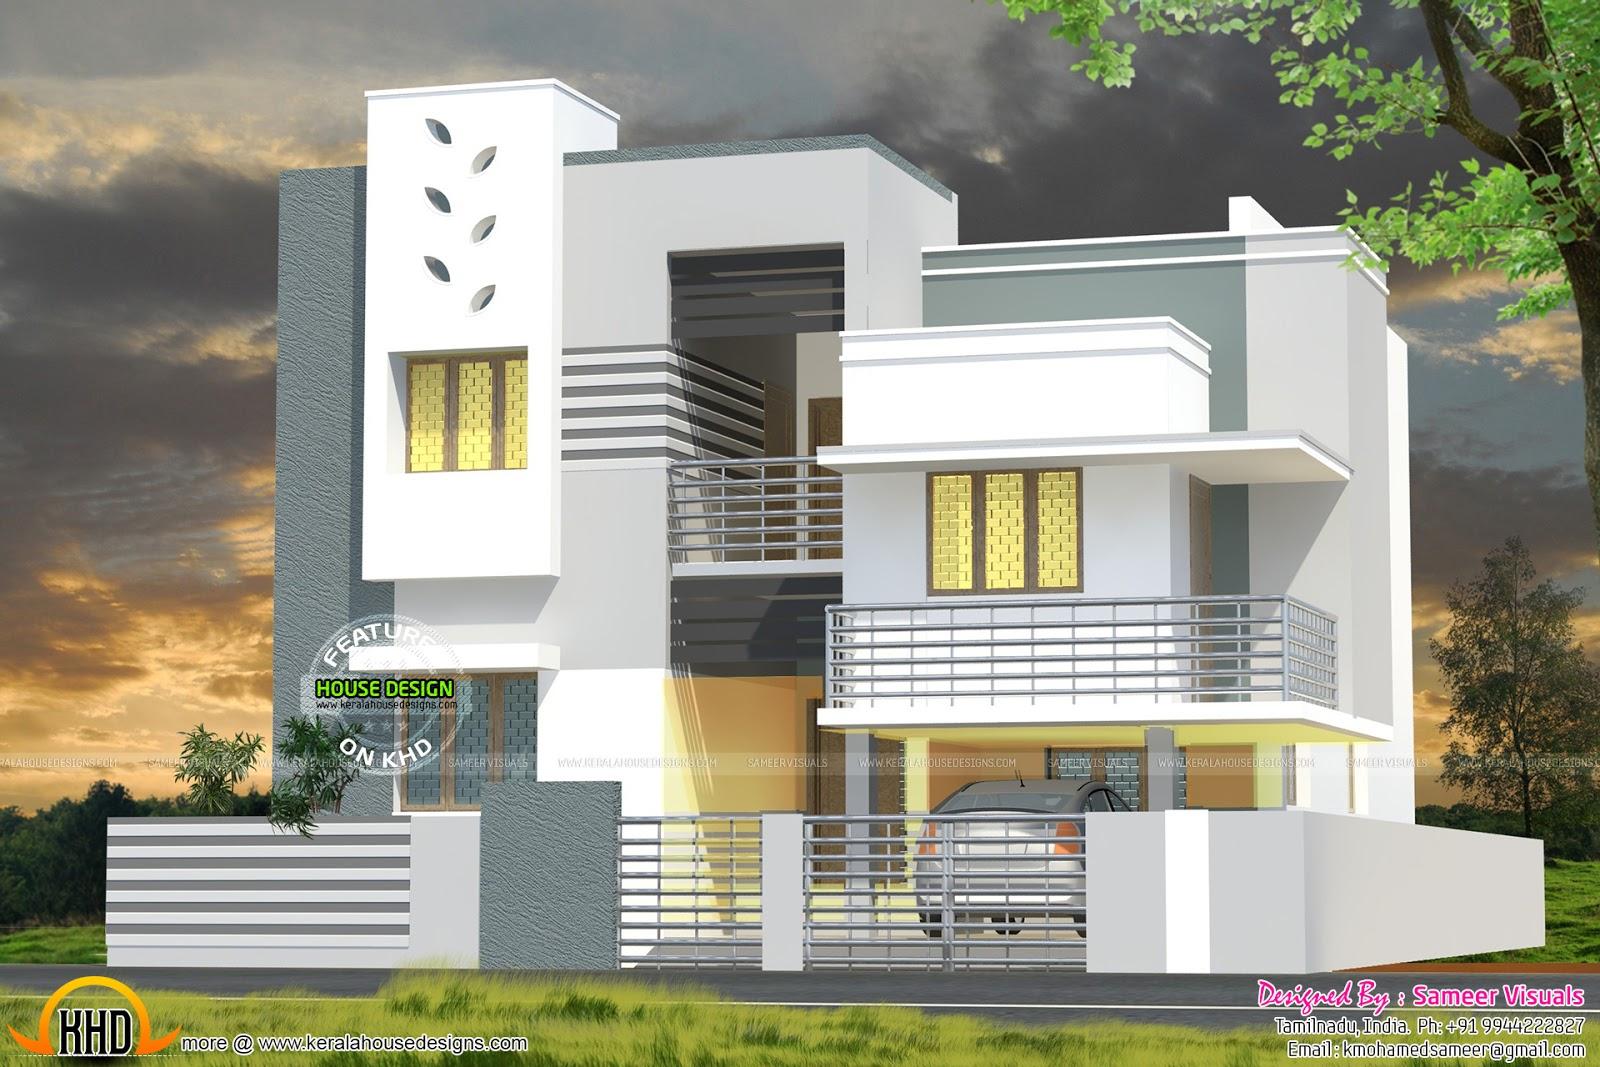 Modern house design - 3000 sq-ft | Kerala home design | Bloglovin' - Modern house design - 3000 sq-ft